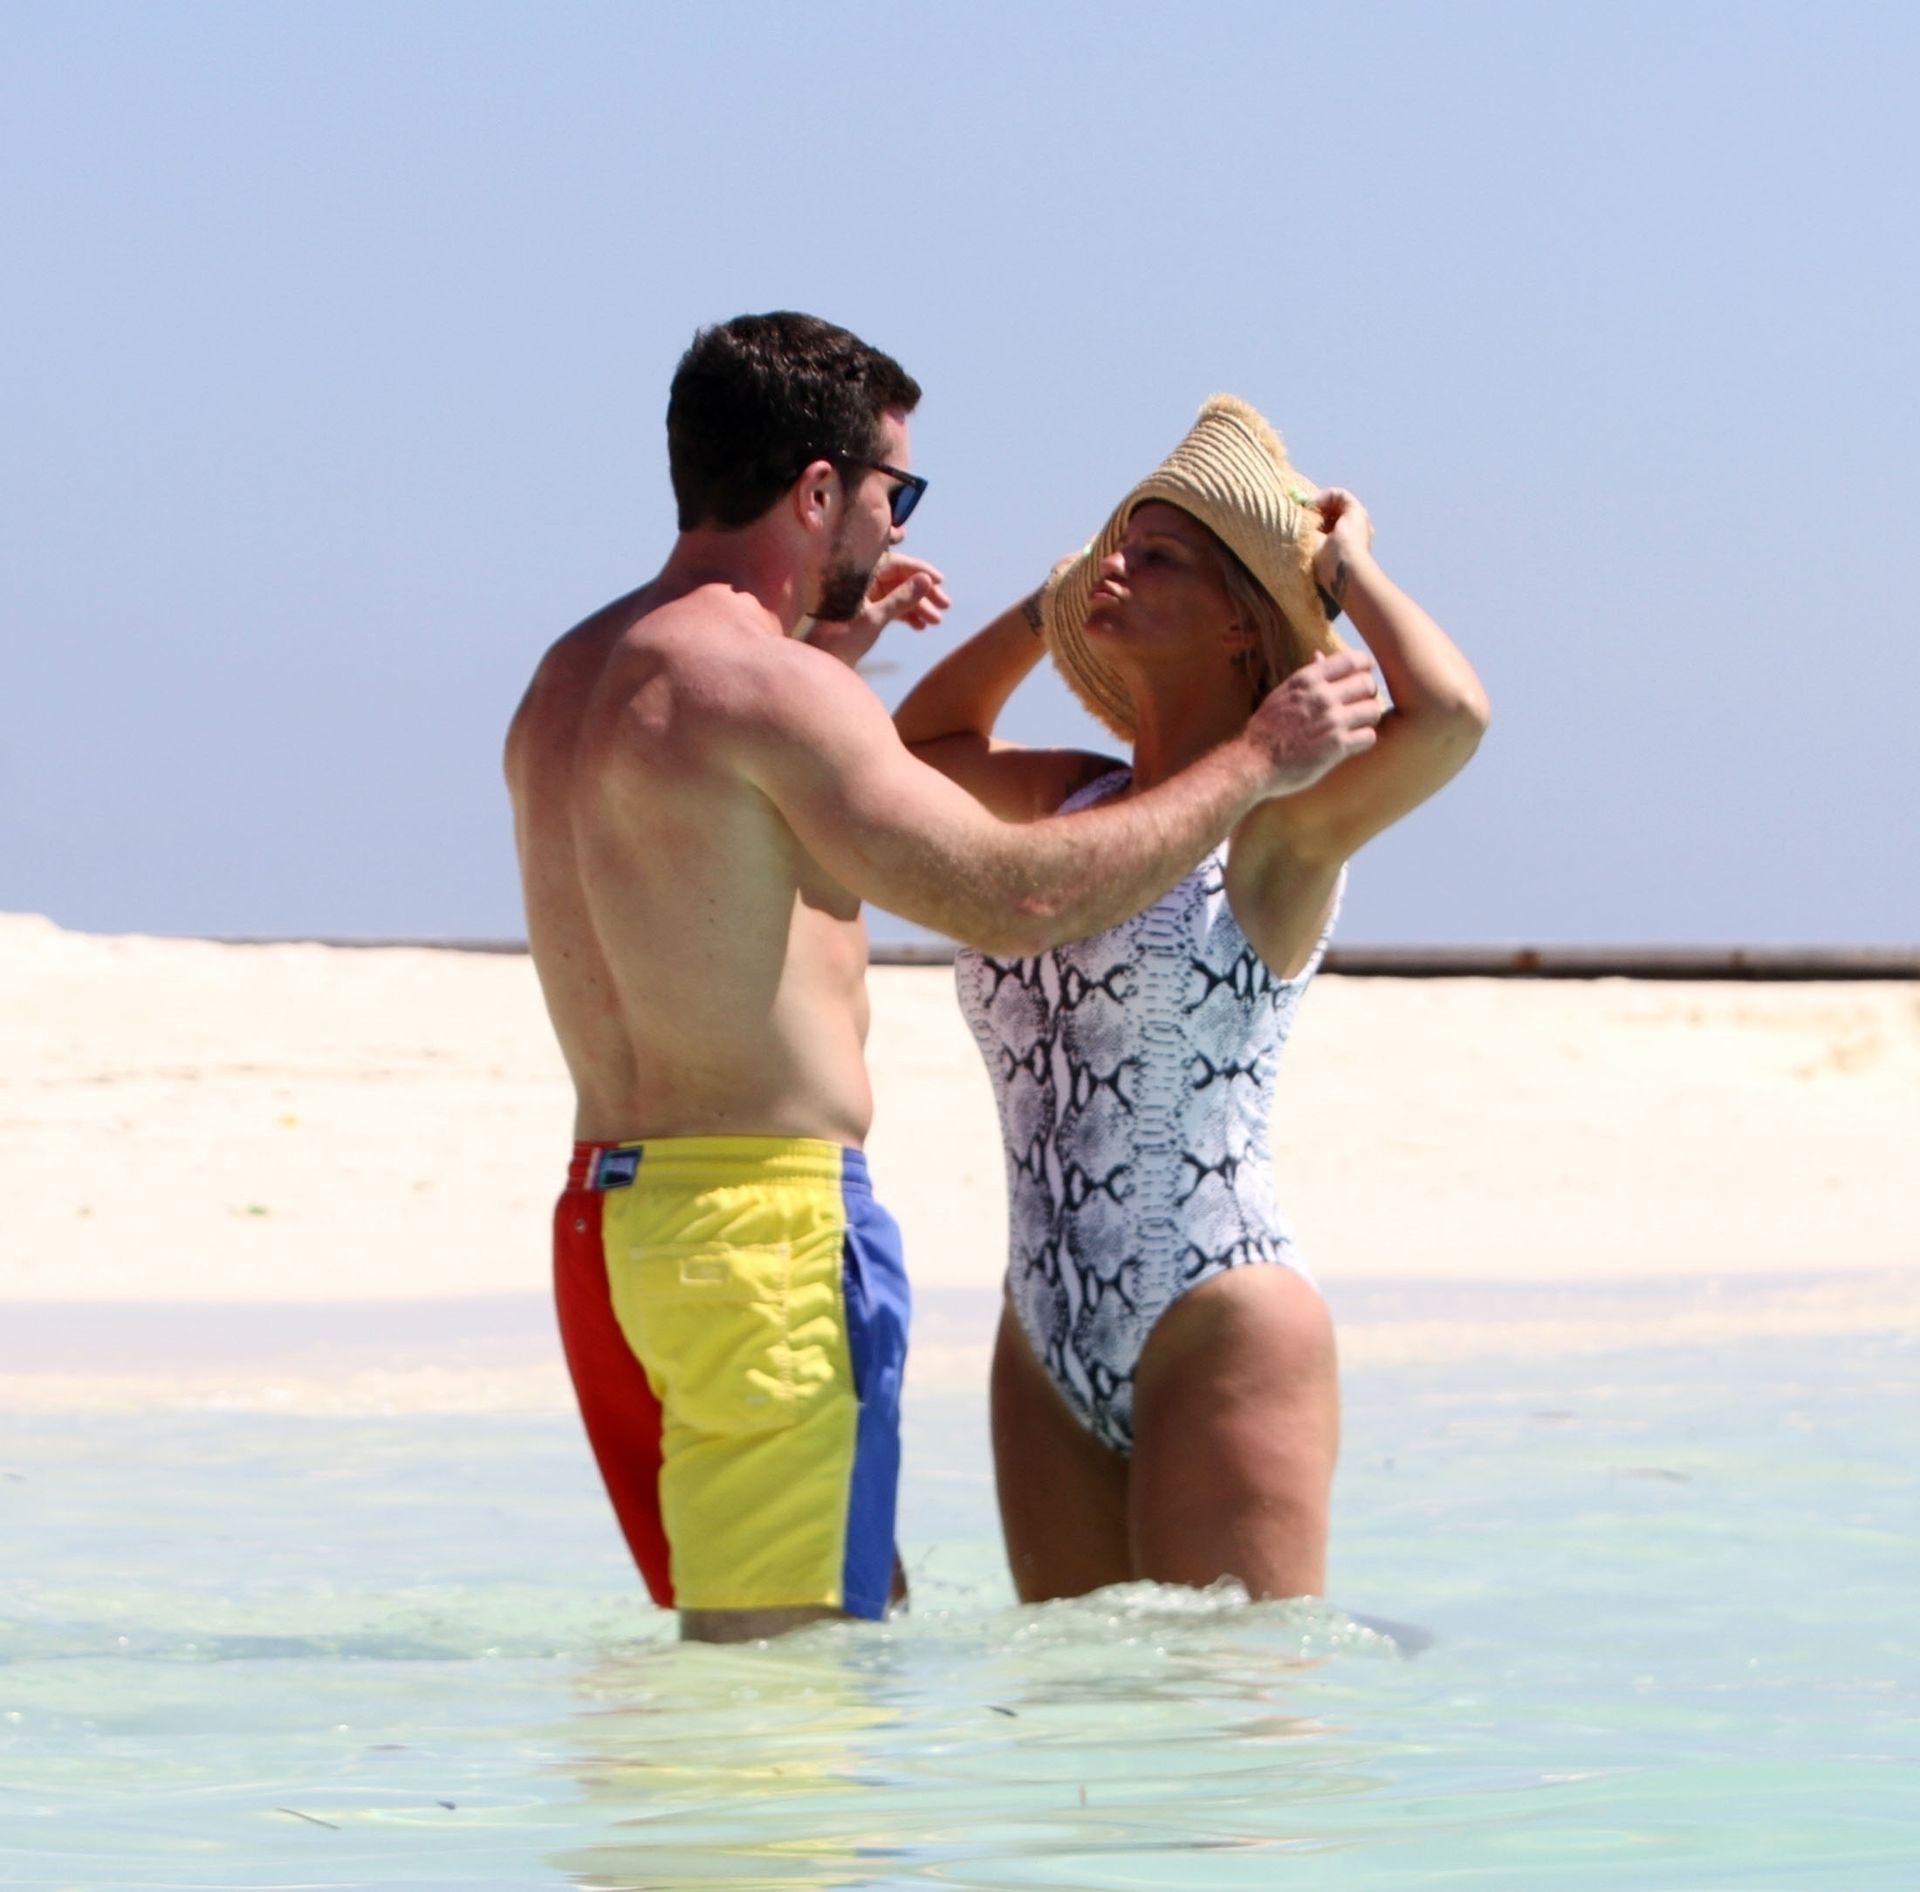 Kerry Katona & Ryan Mahoney Hit The Beach On Holiday At Their Luxury 5 Star Resort Ayada Maldives 0023